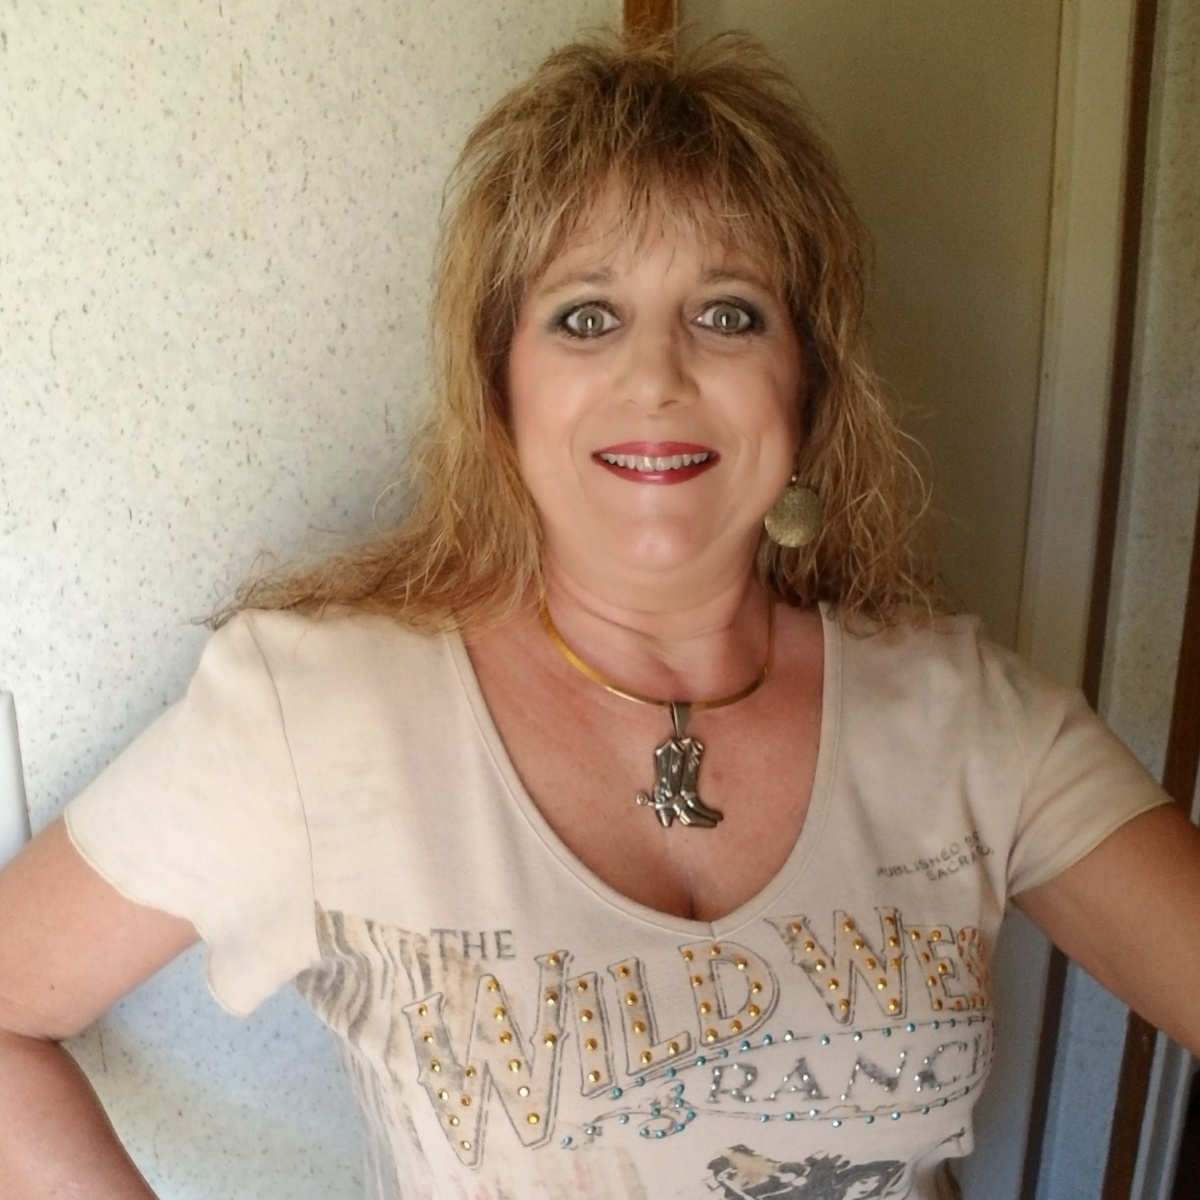 Kimberly G. Shingleton